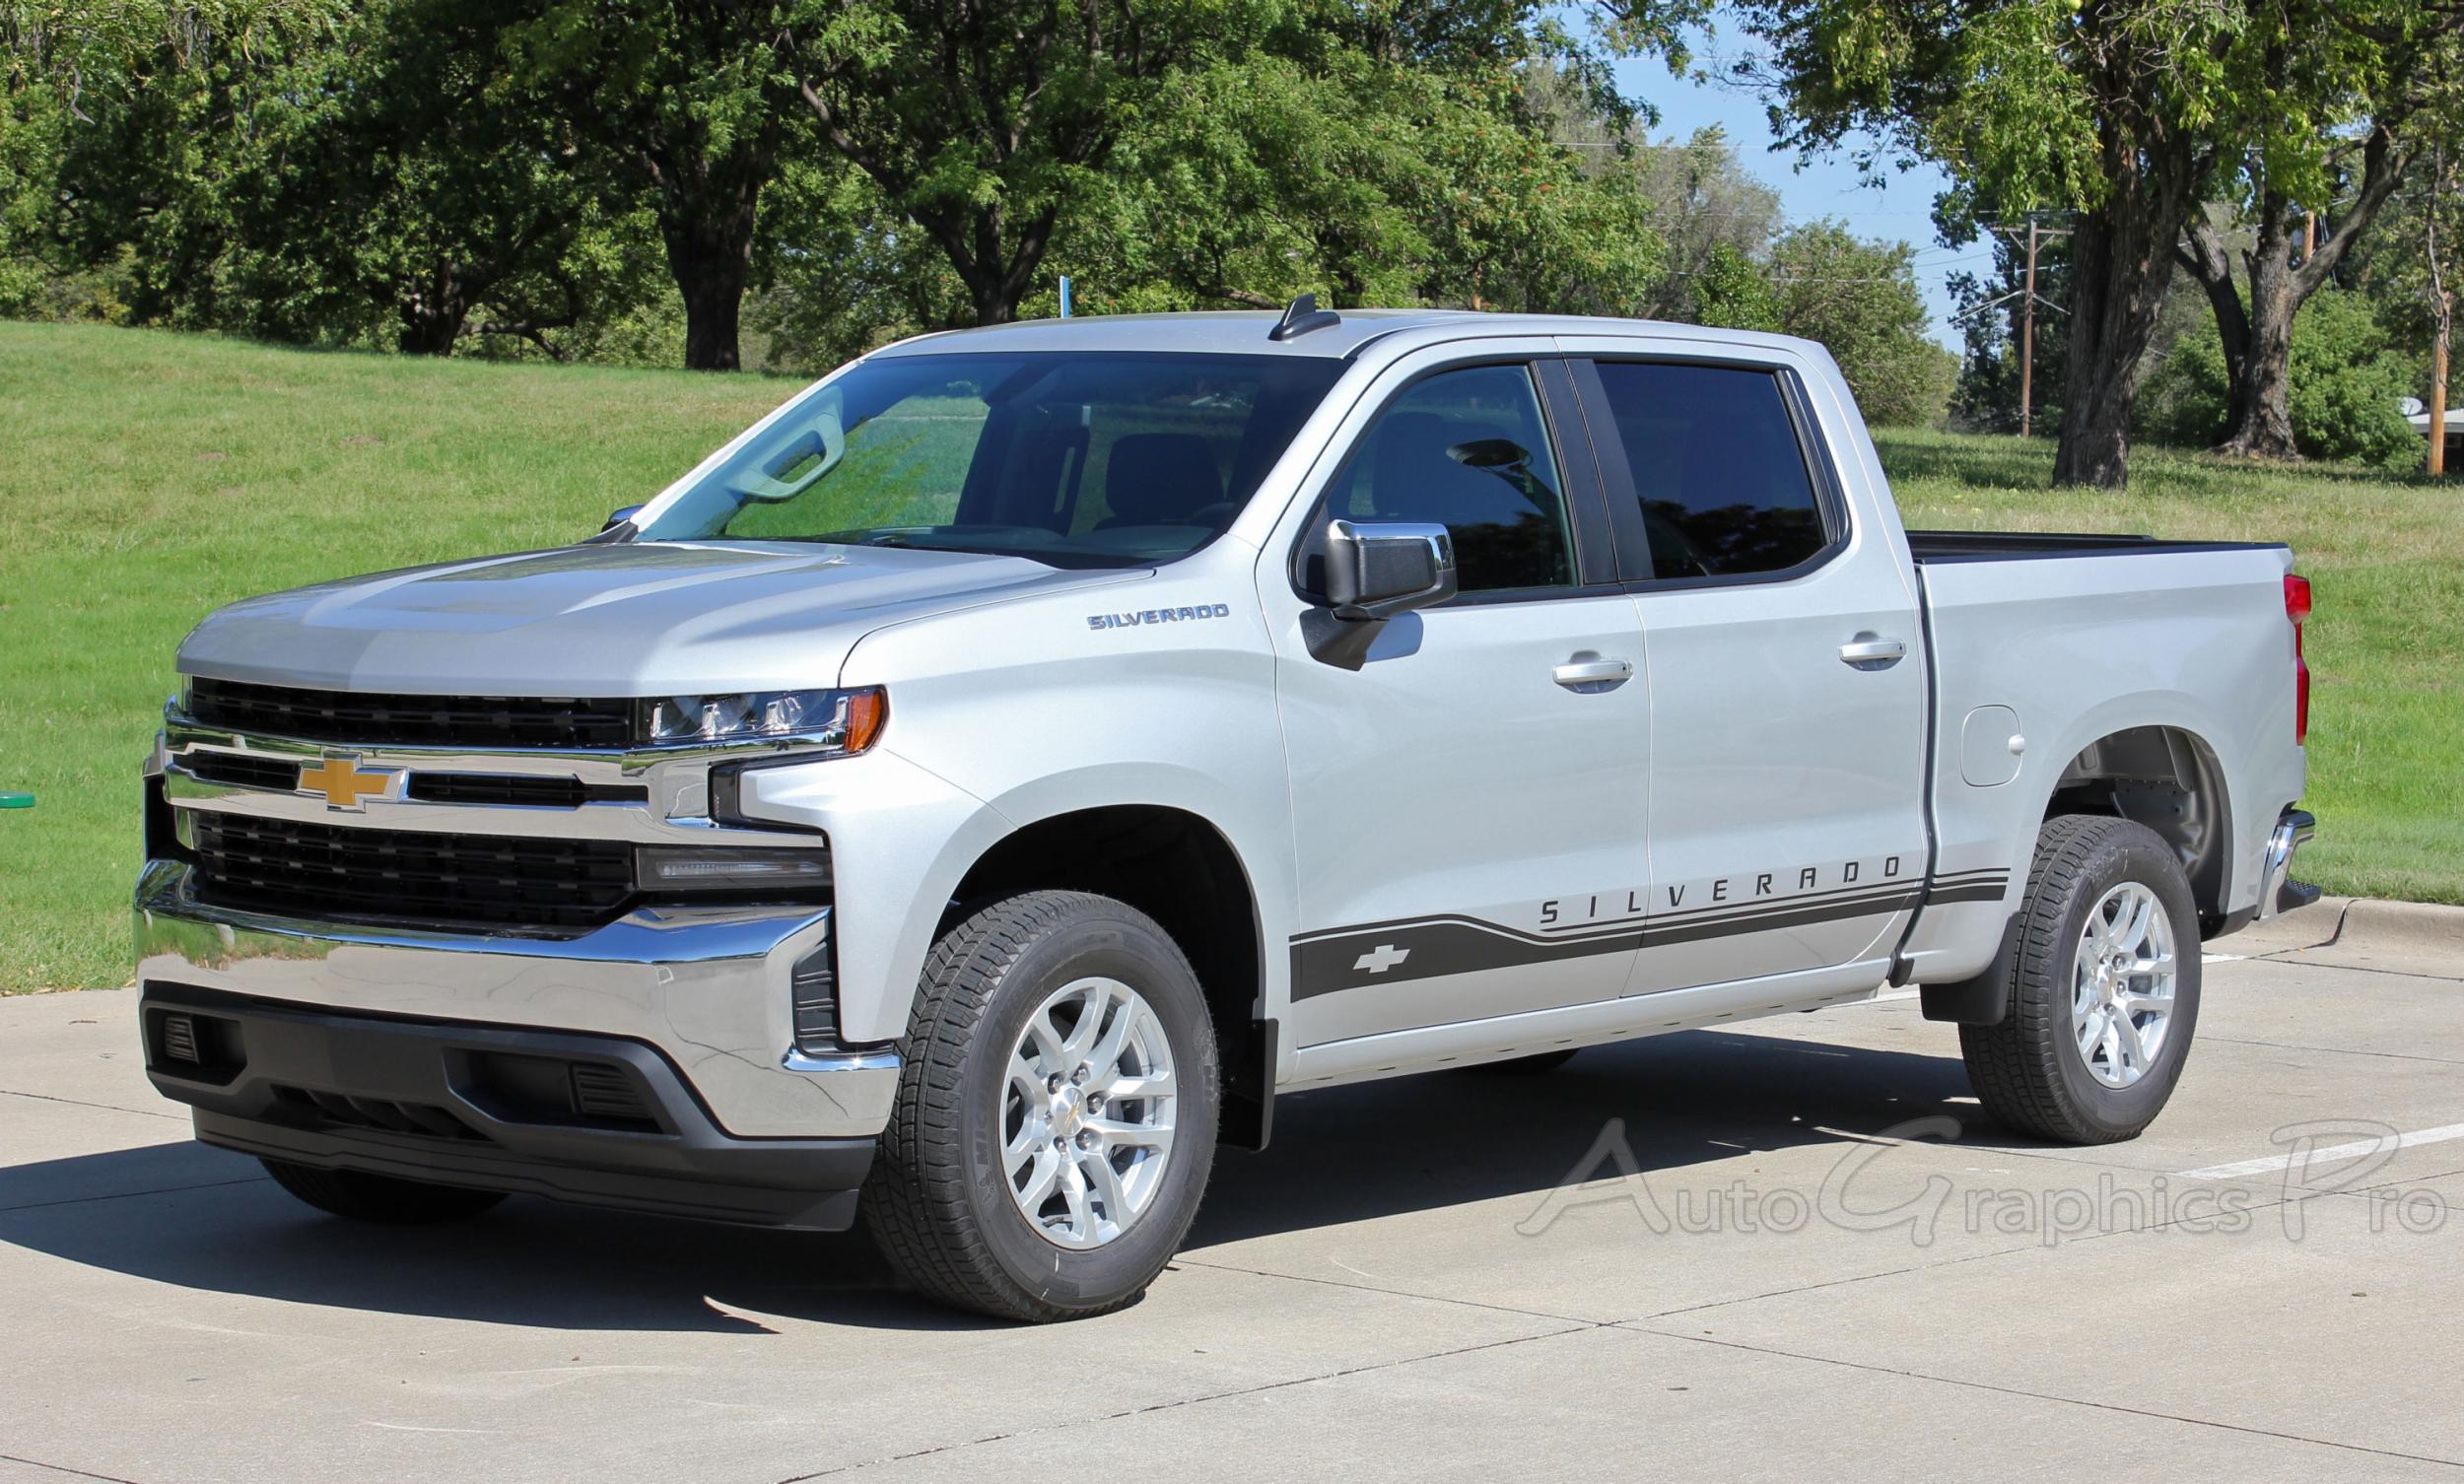 2019 Chevy Silverado Stripes Rocker One Door Decals Lower